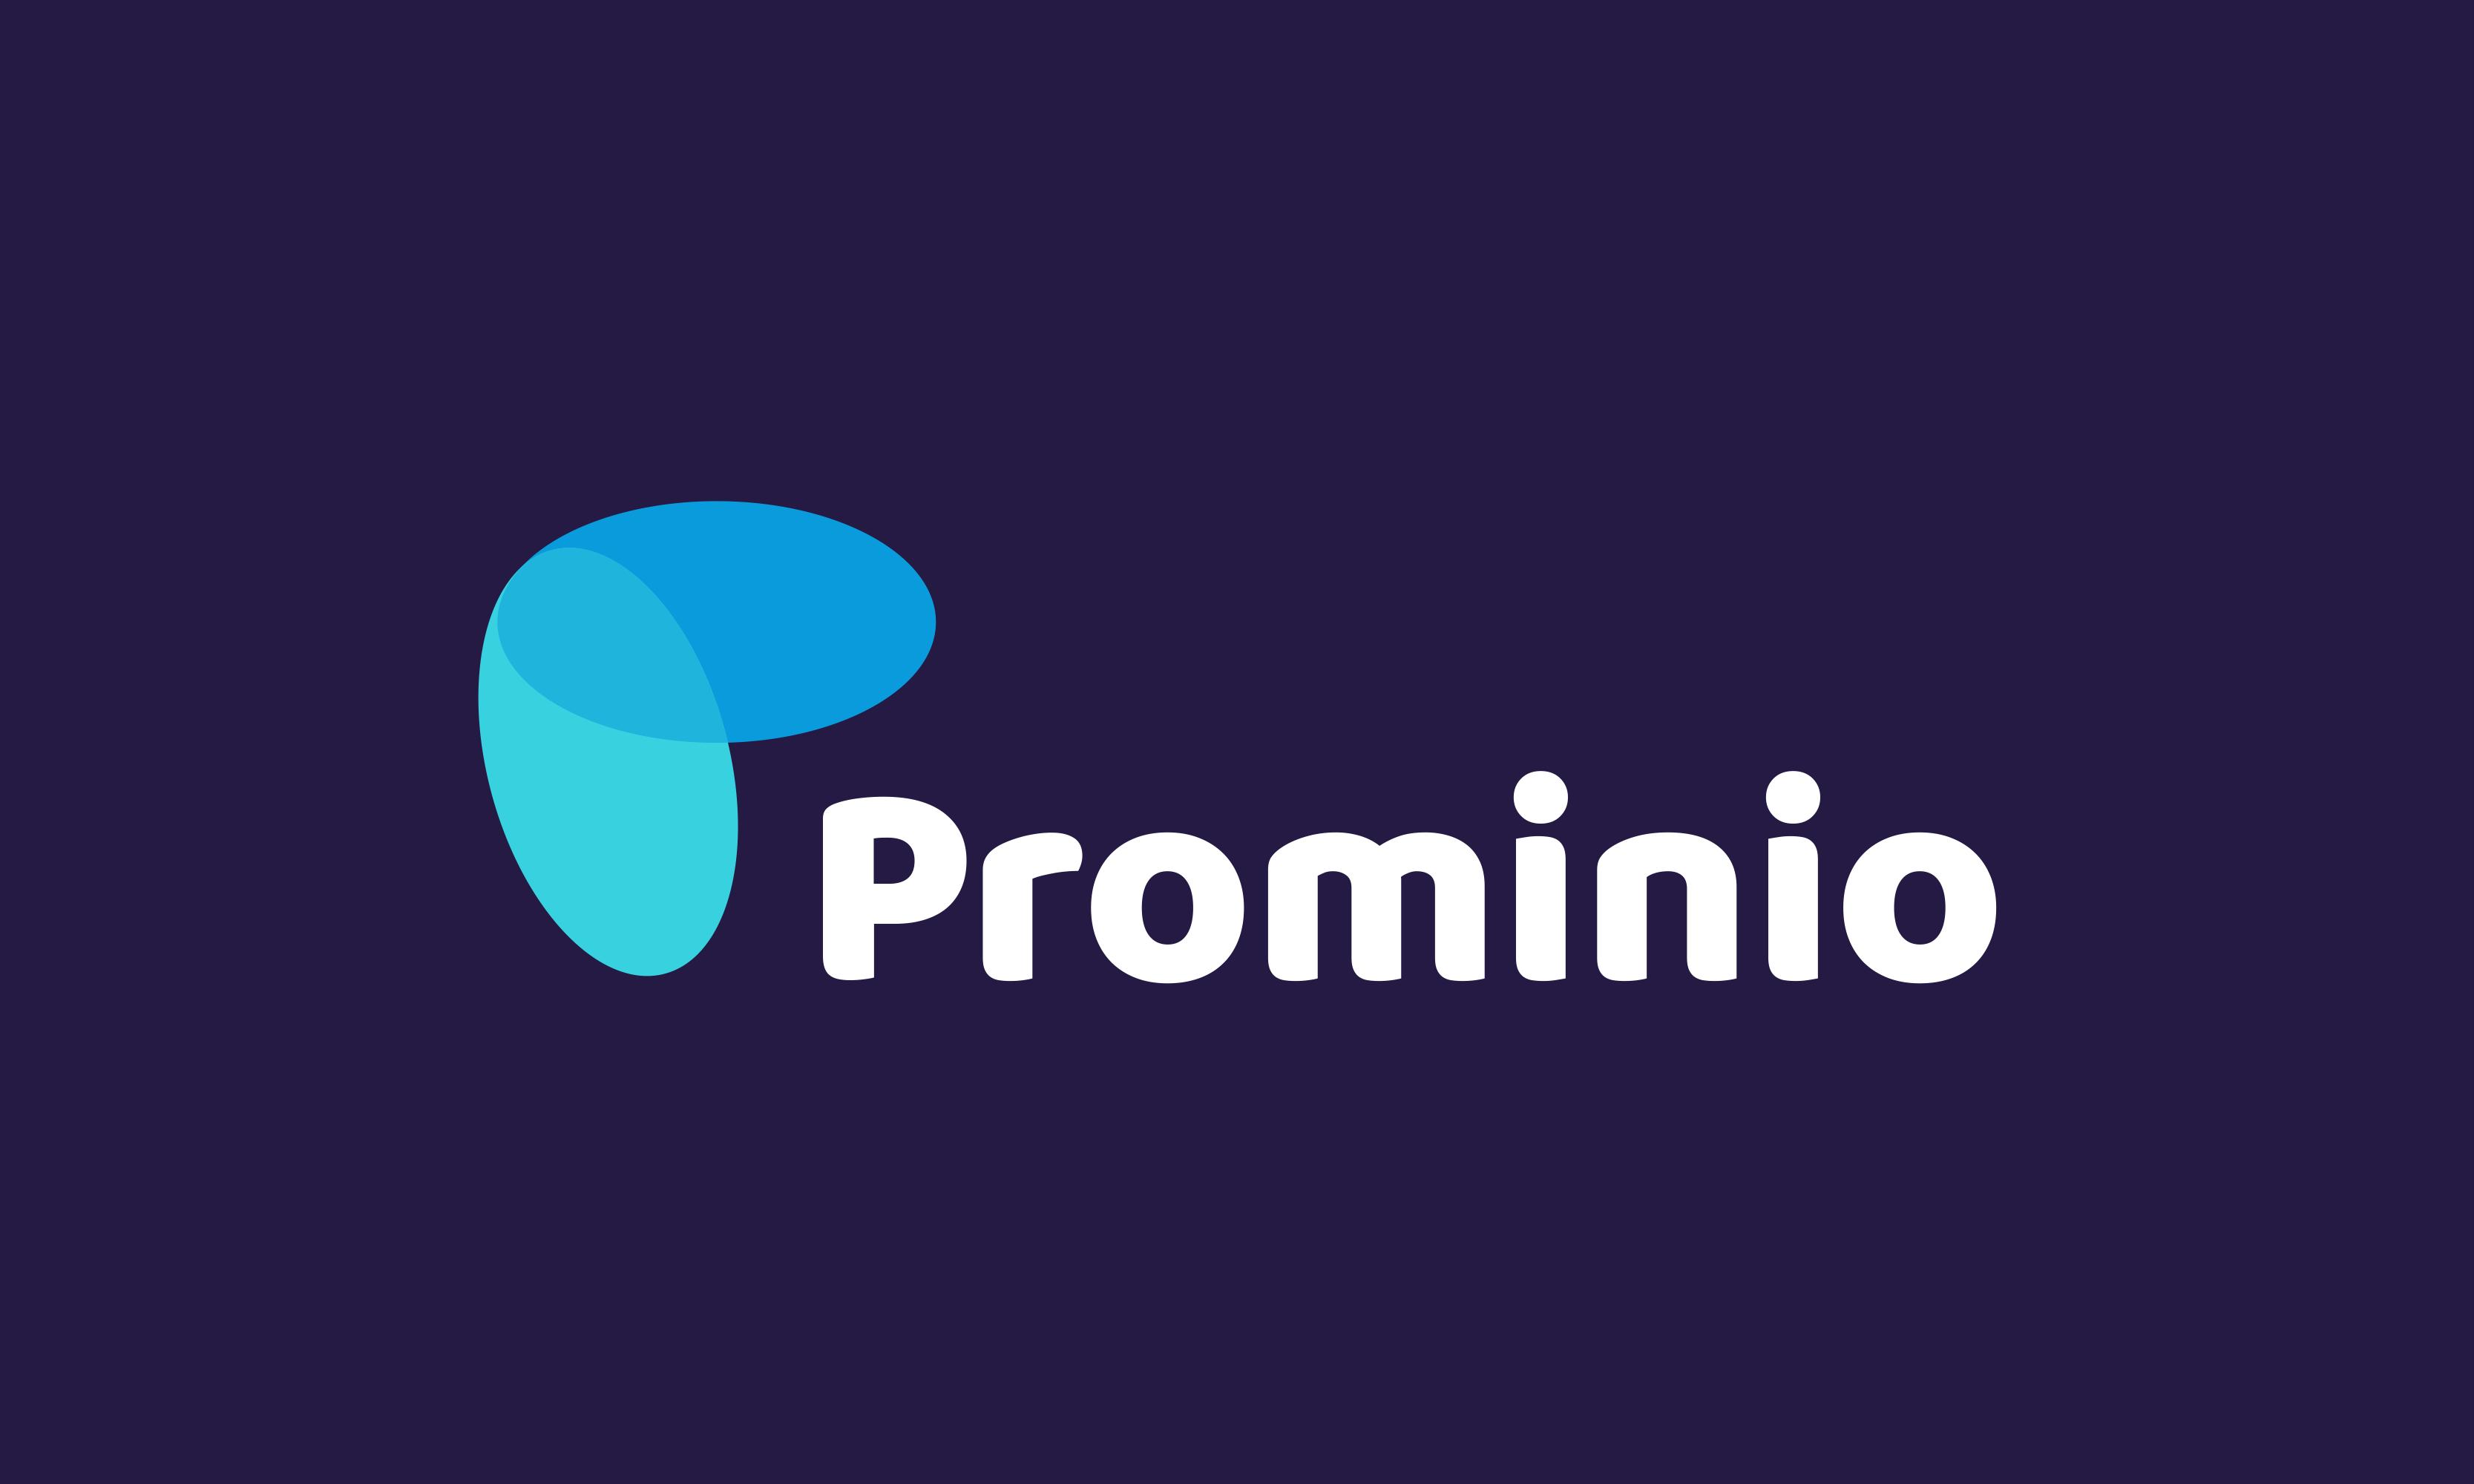 Prominio